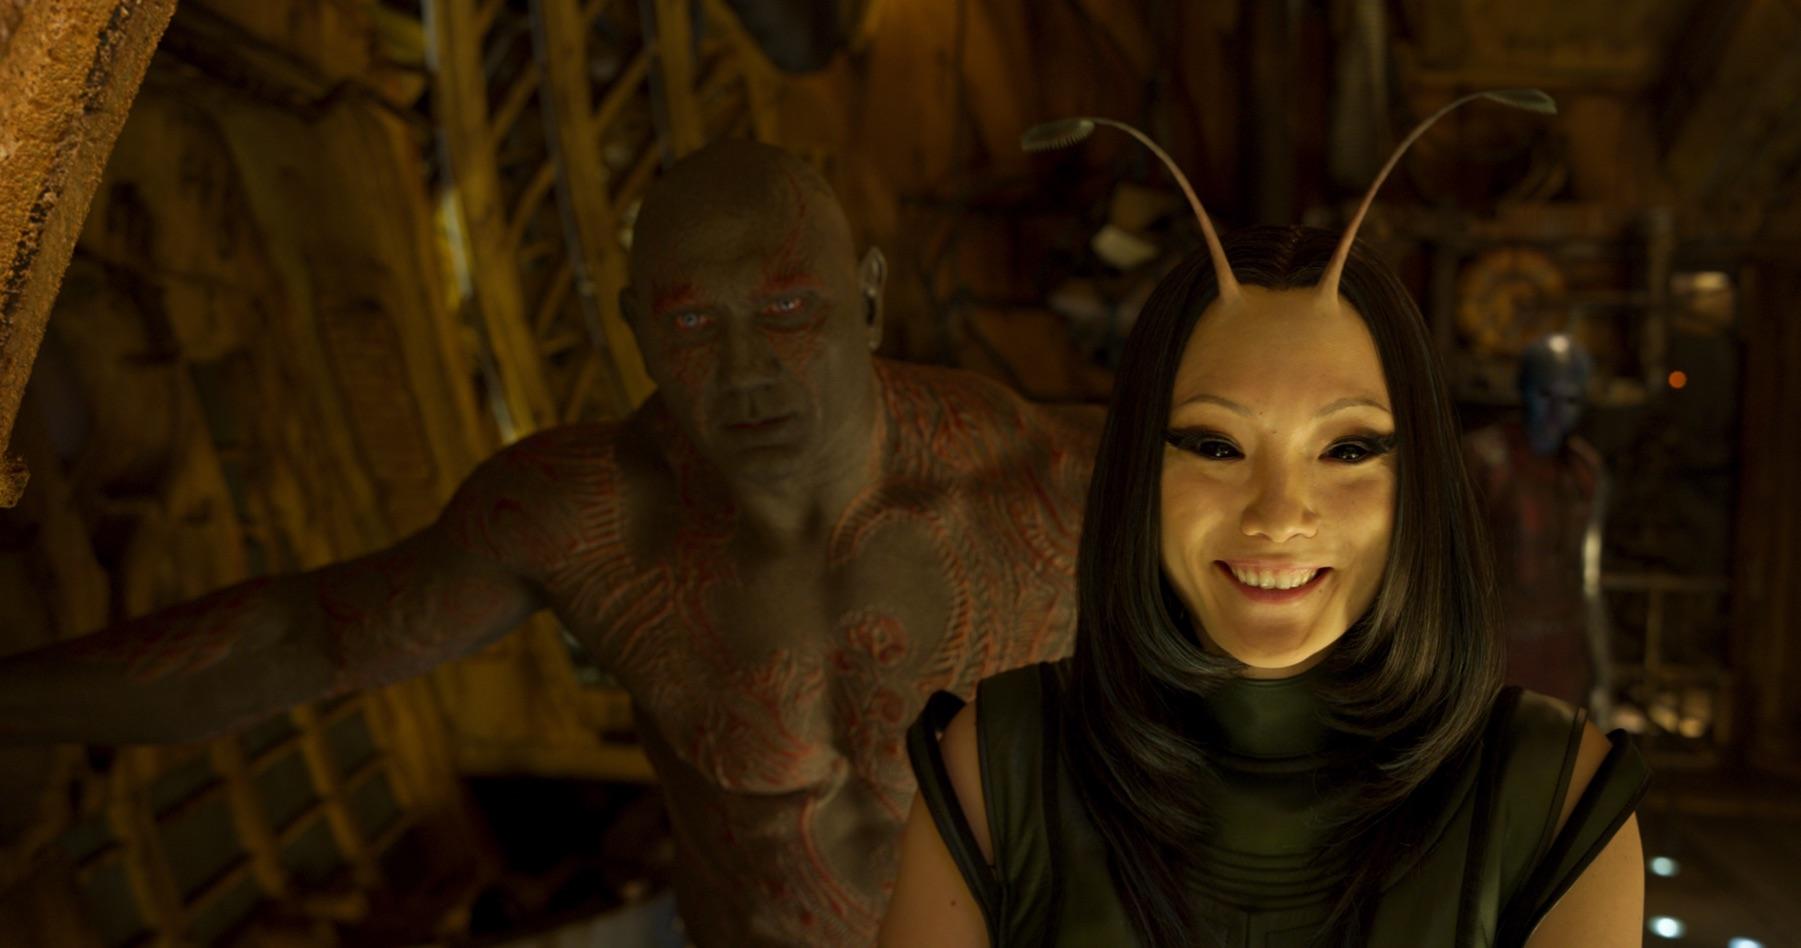 Pom Klementieff as Mantis